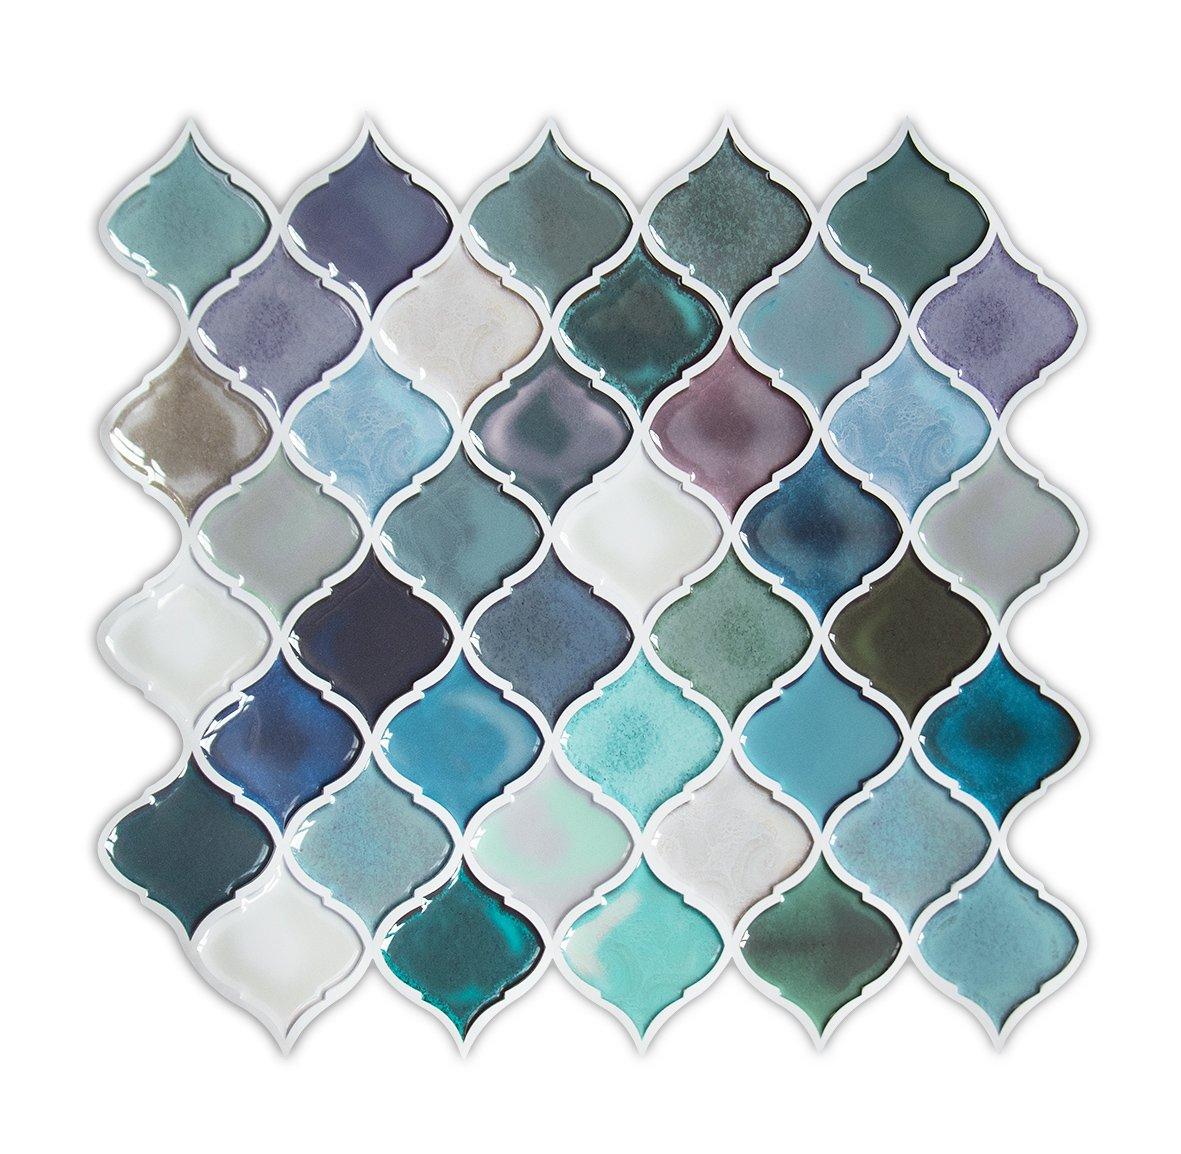 Turquoise Peel and Stick Tile Backsplash for Kitchen, Decorative Vinyl Backsplash Peel and Stick for Rental House, Stick on Backsplash Tiles for RV Kitchen,Smart Arabesque Tile Pack of 6 by HUE DECORATION